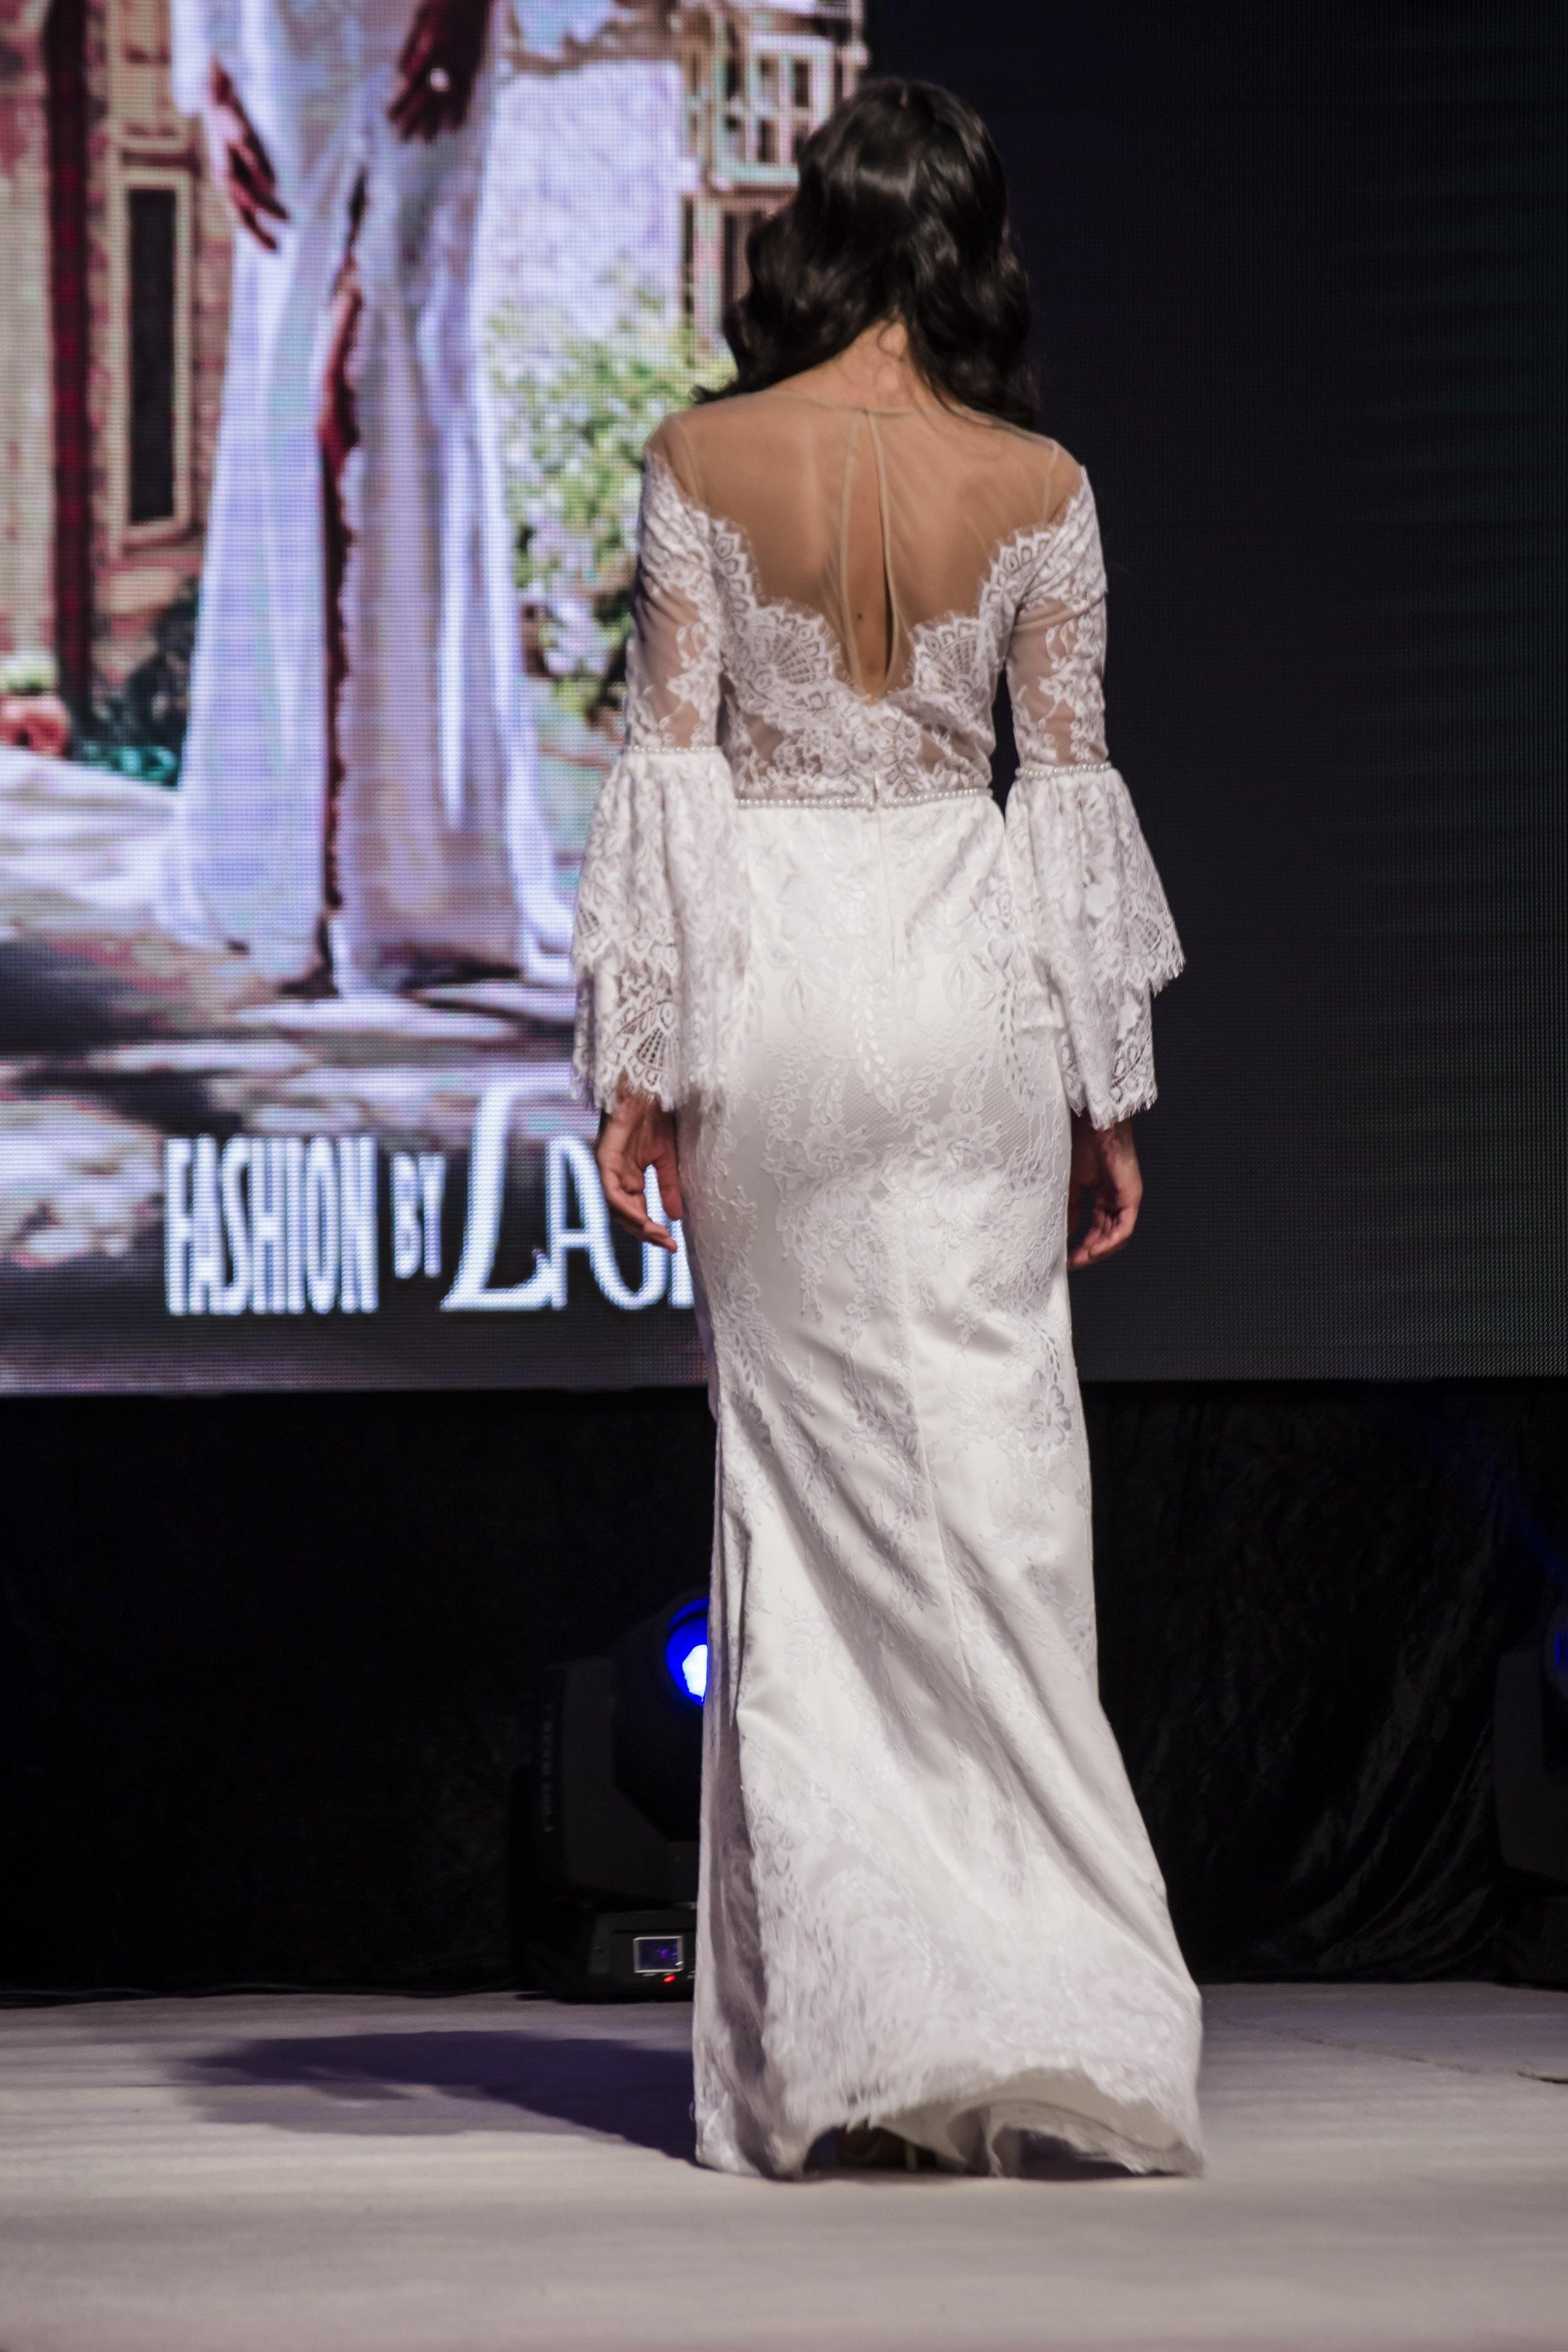 Pivoine 2018 Wedding Dress - Fashion By Laina